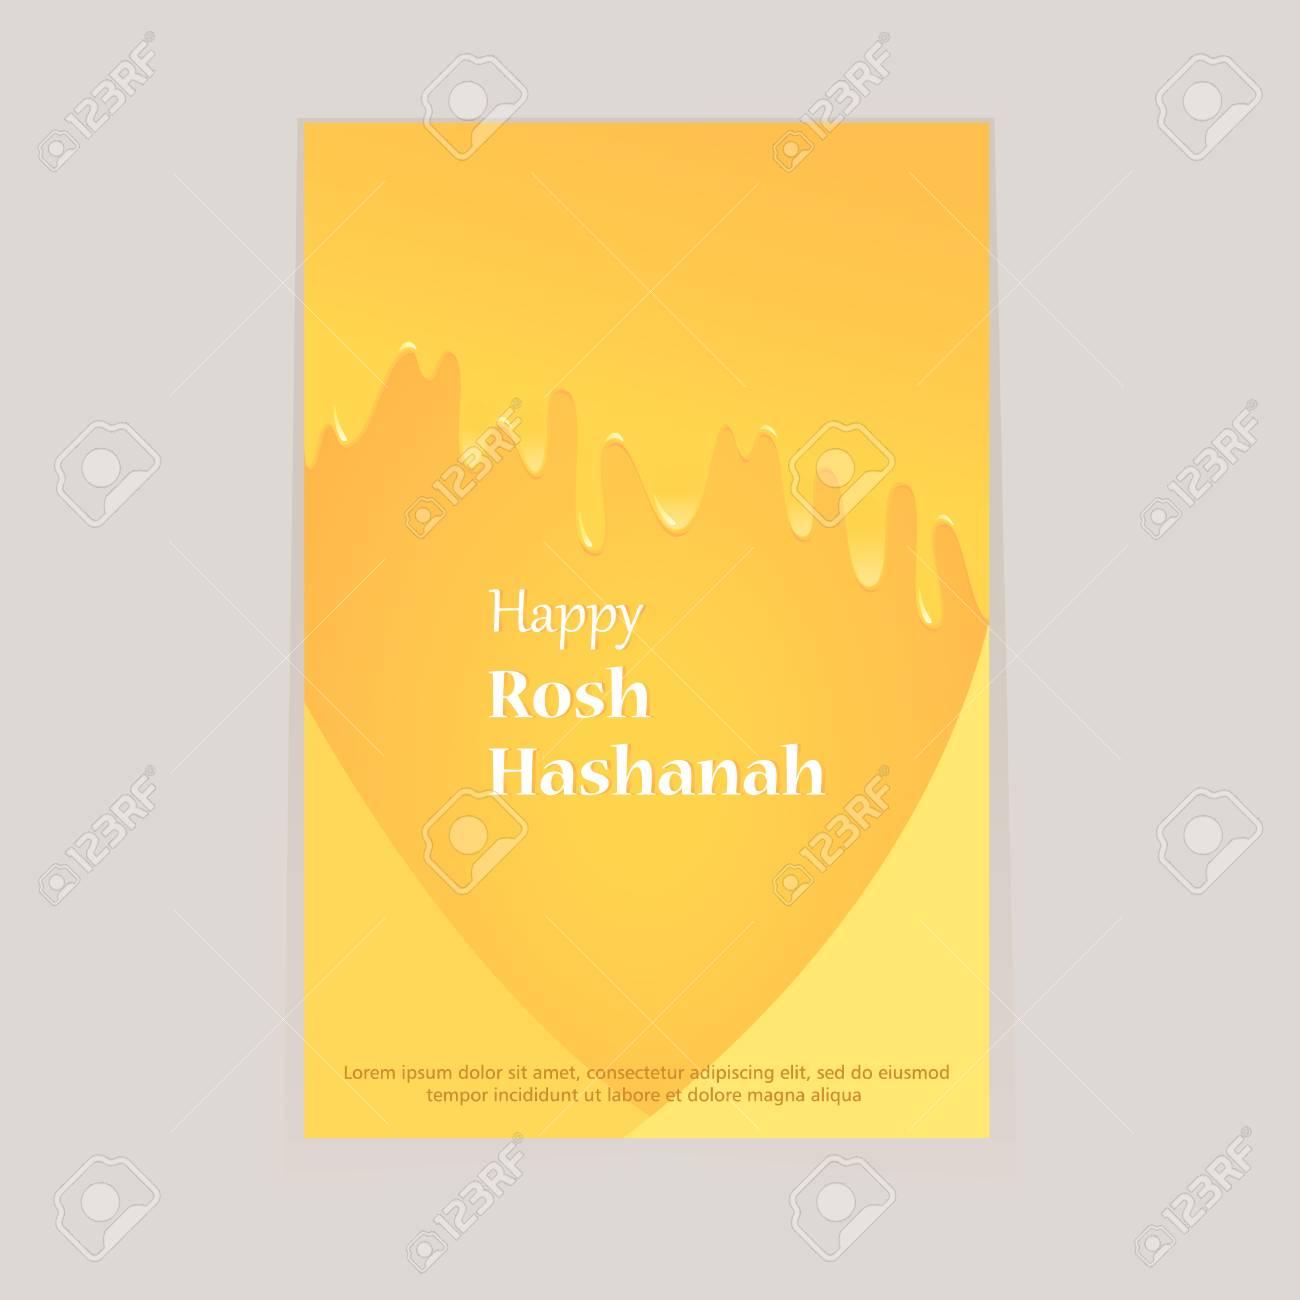 Greeting Card For Rosh Hashanah Day Tasty Honey Draining From